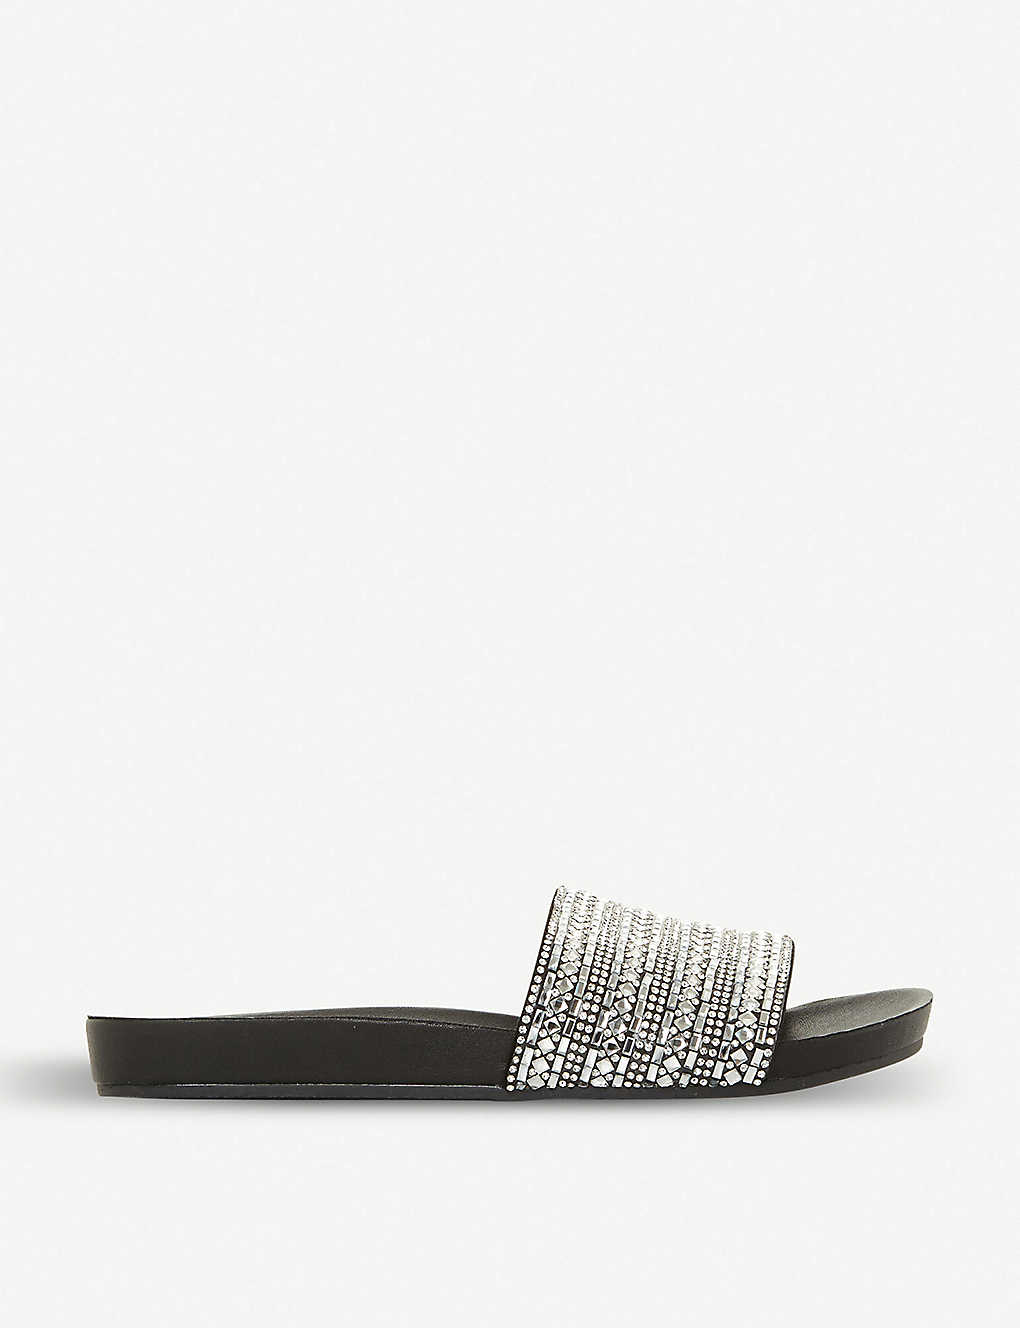 6f0bf39c88b STEVE MADDEN - Fancy rhinestone-embellished flat sandal | Selfridges.com